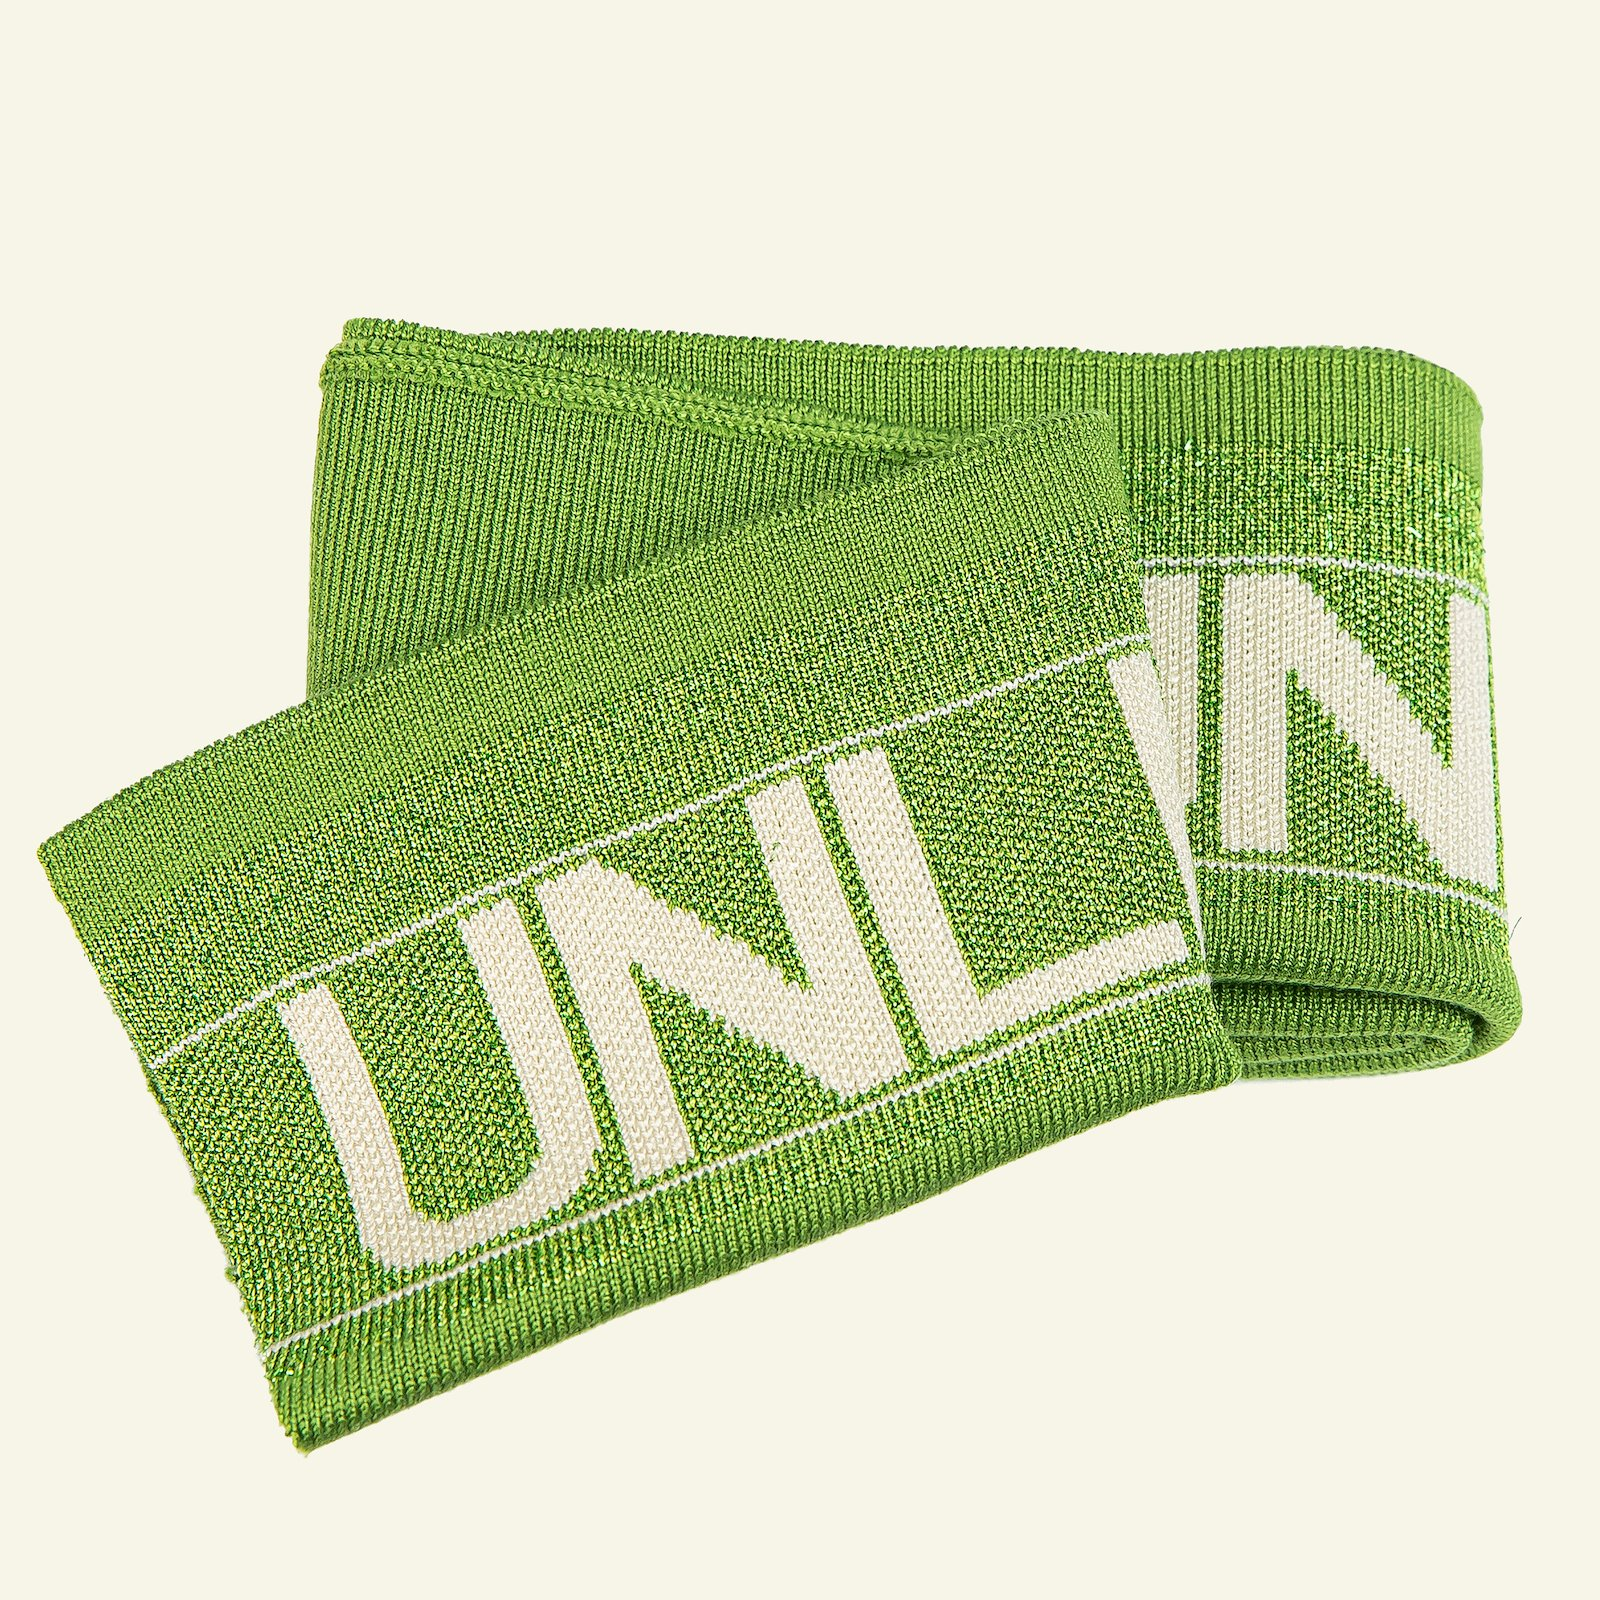 1x1 rib fold 13,5x100cm grøn lurex 1pc 96185_pack